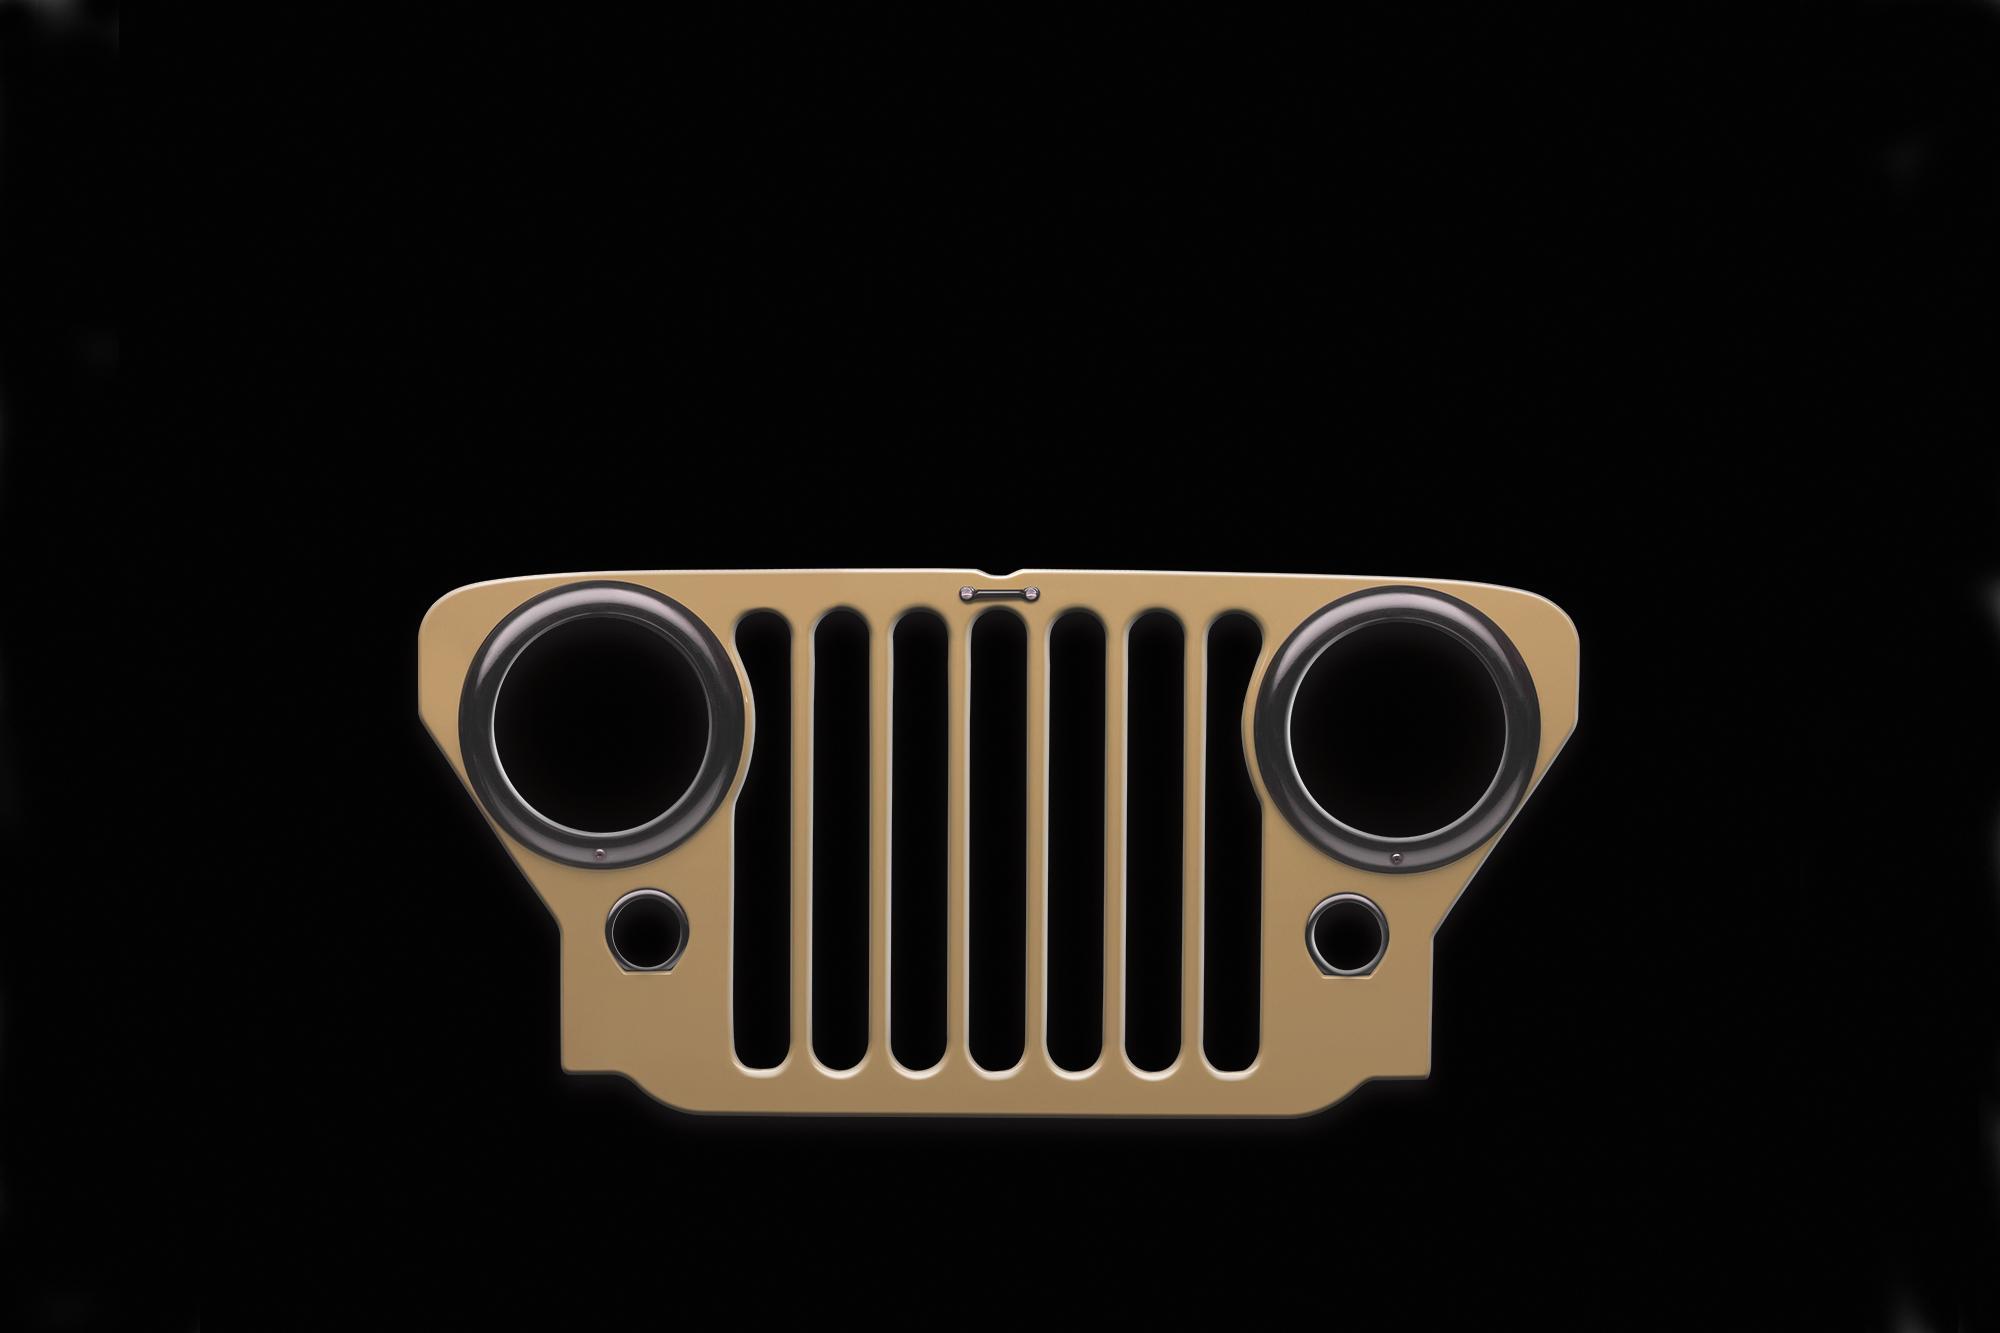 Jeep: Ο ορισμός του διαχρονικού σχεδιασμού.